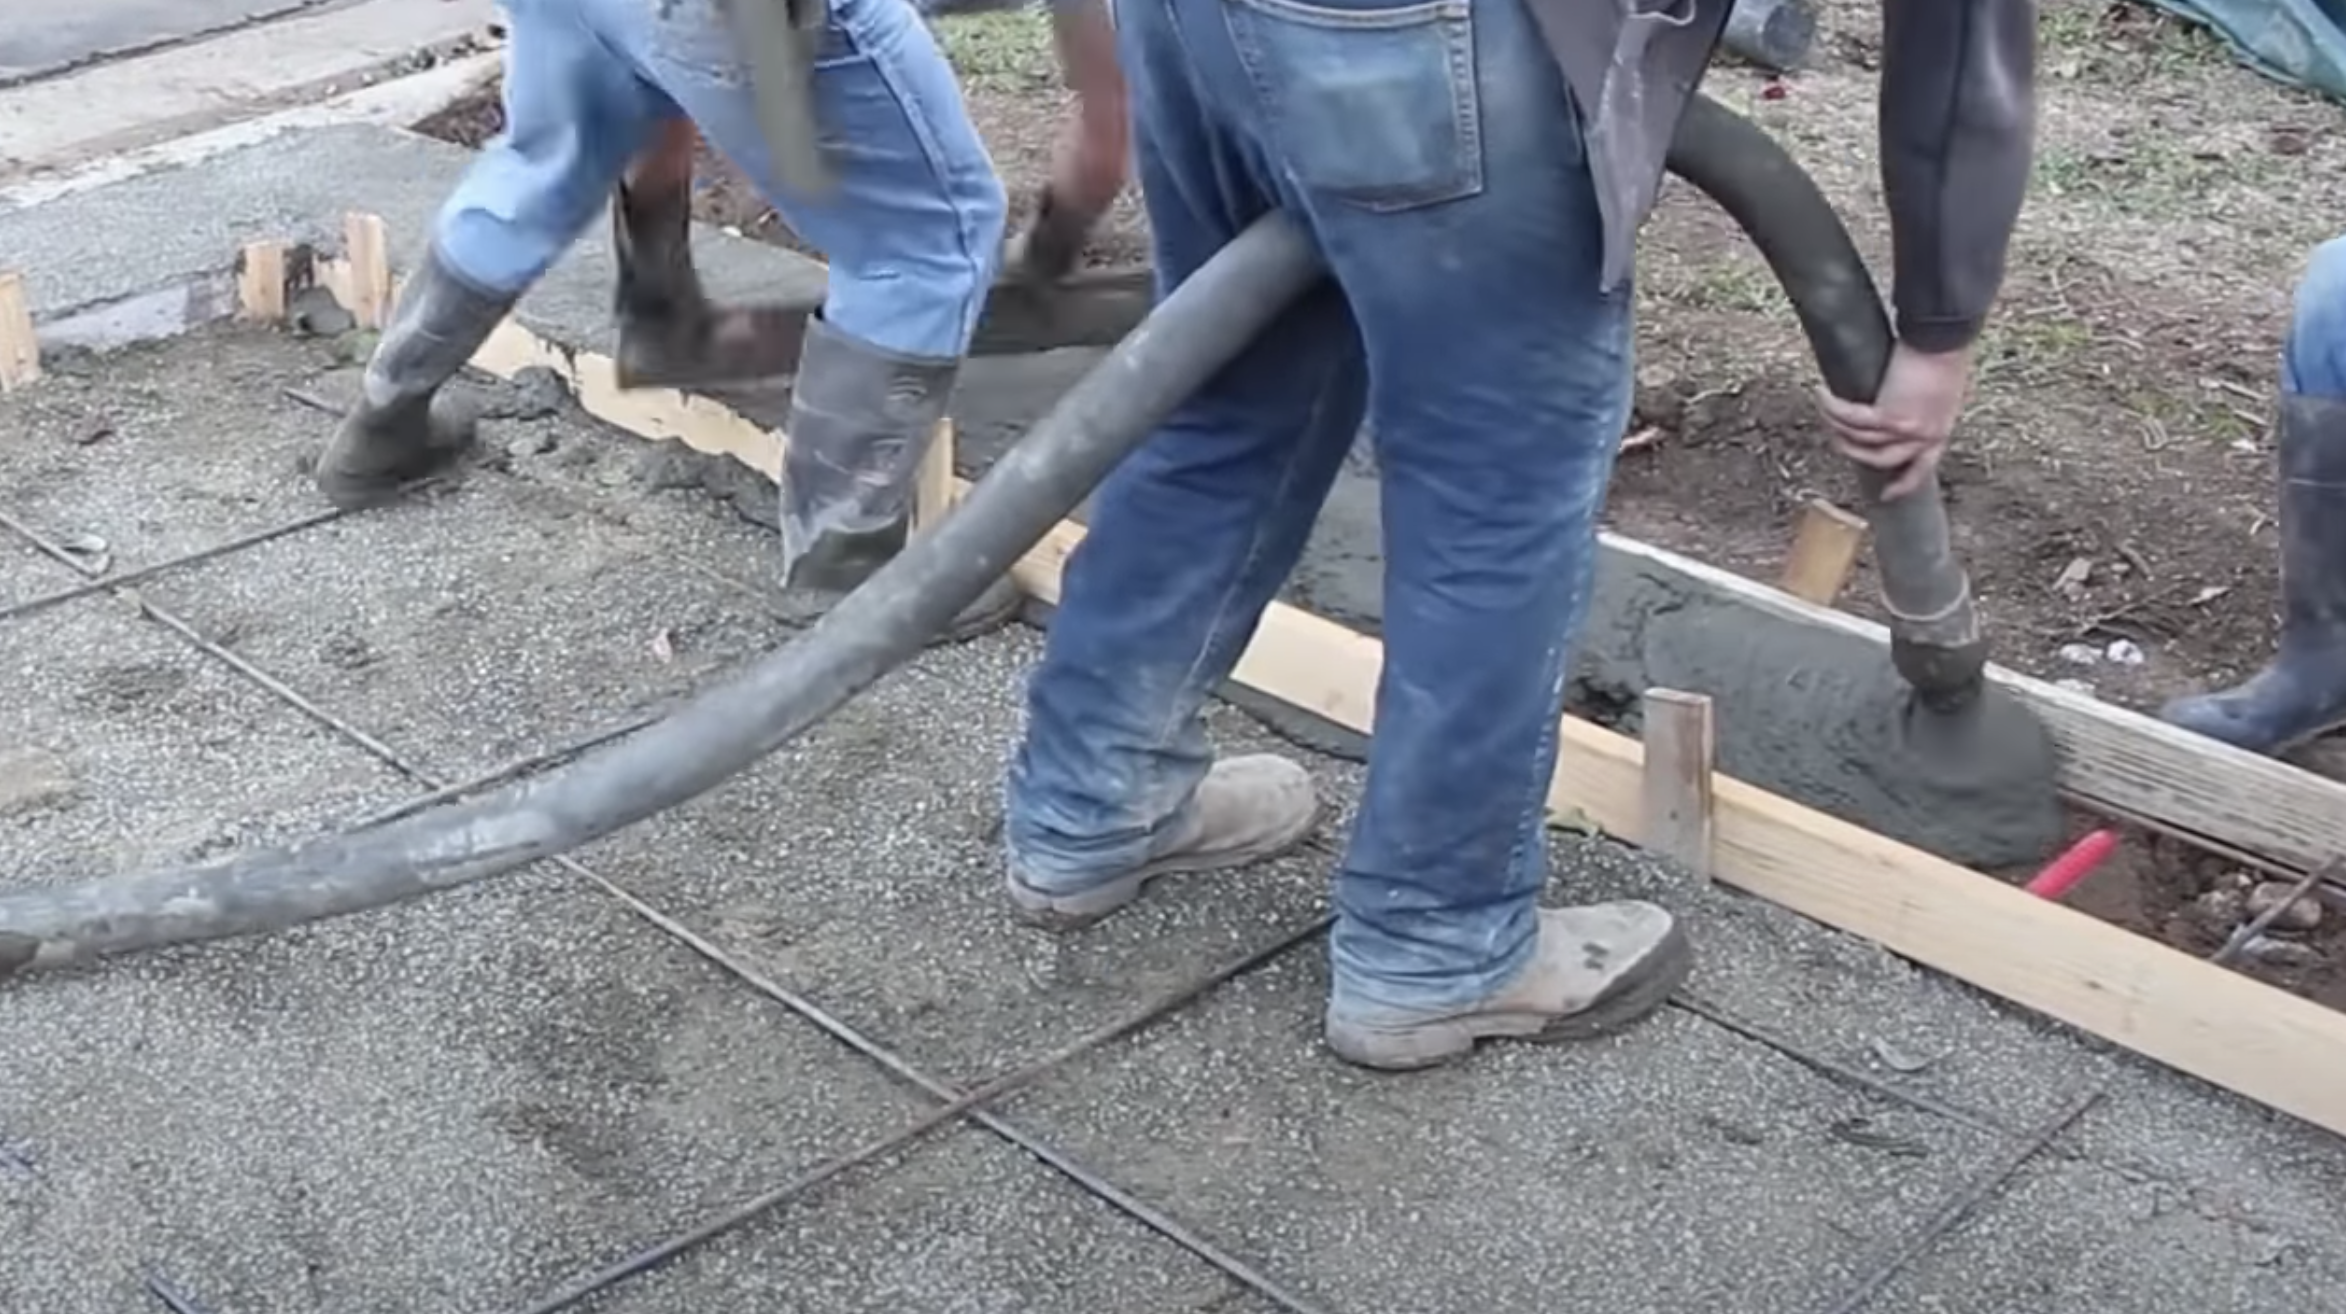 this image shows sacramento concrete pumping contractors at work